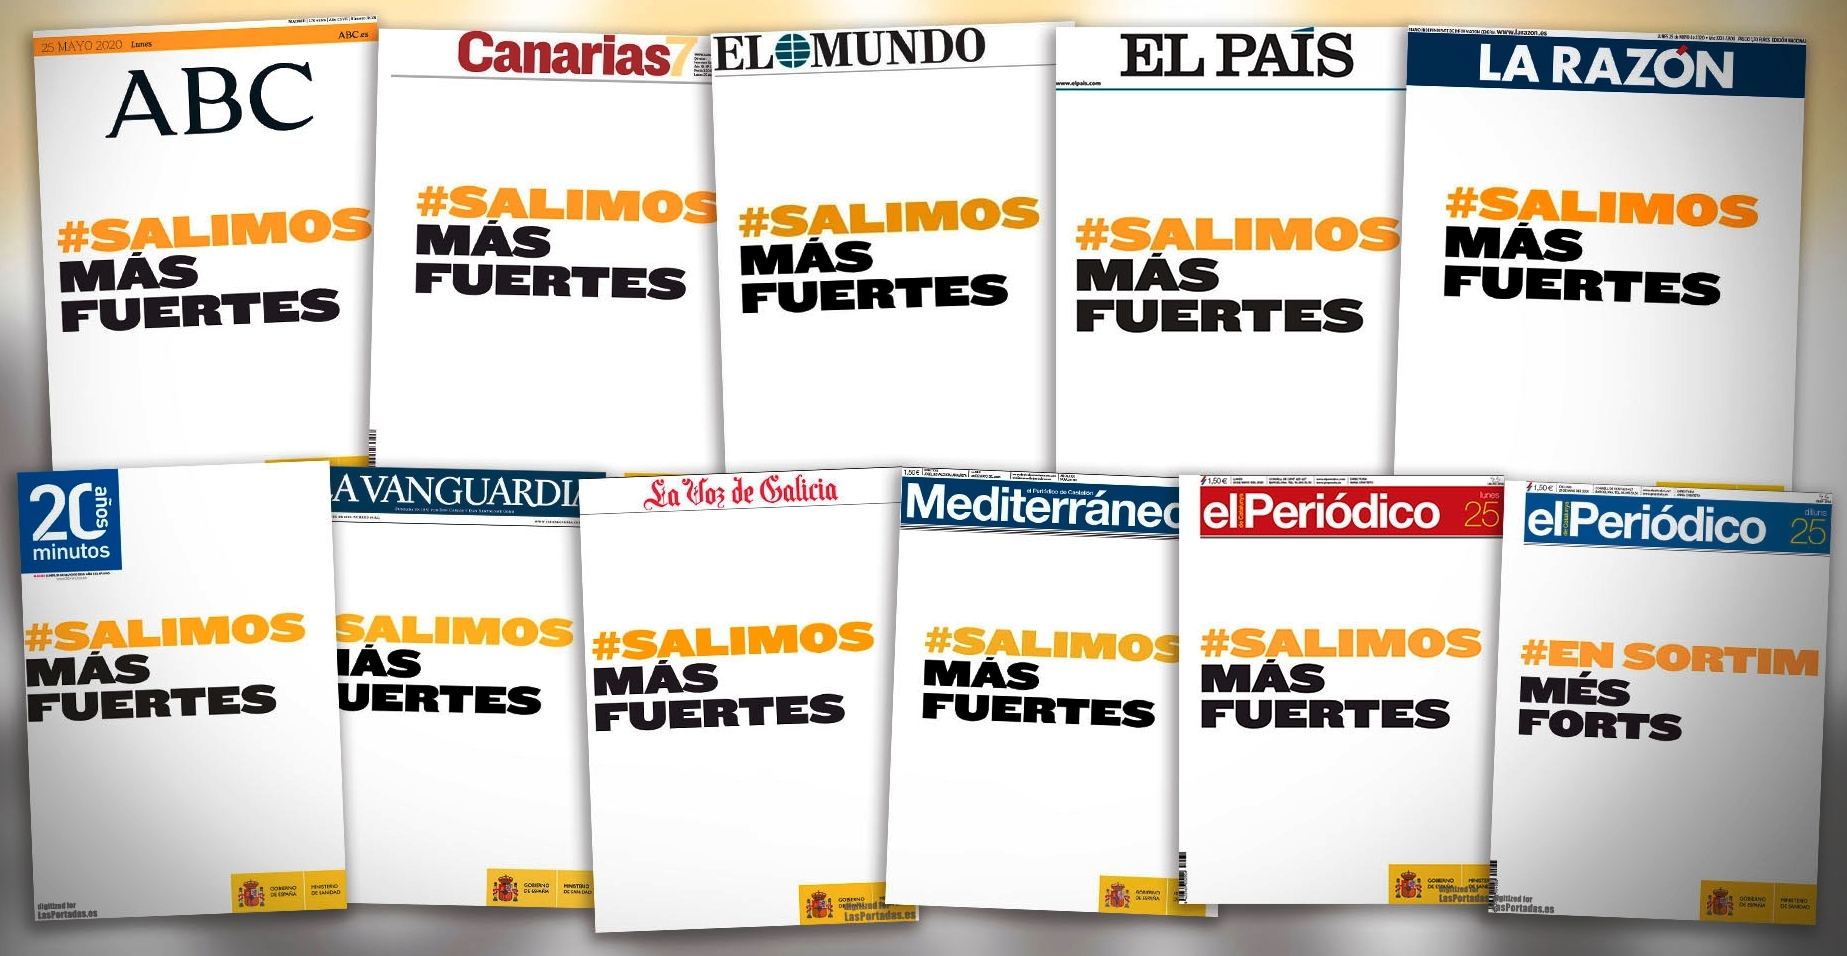 «#SalimosMasFuertes». Emilio Domínguez Díaz. Profesor